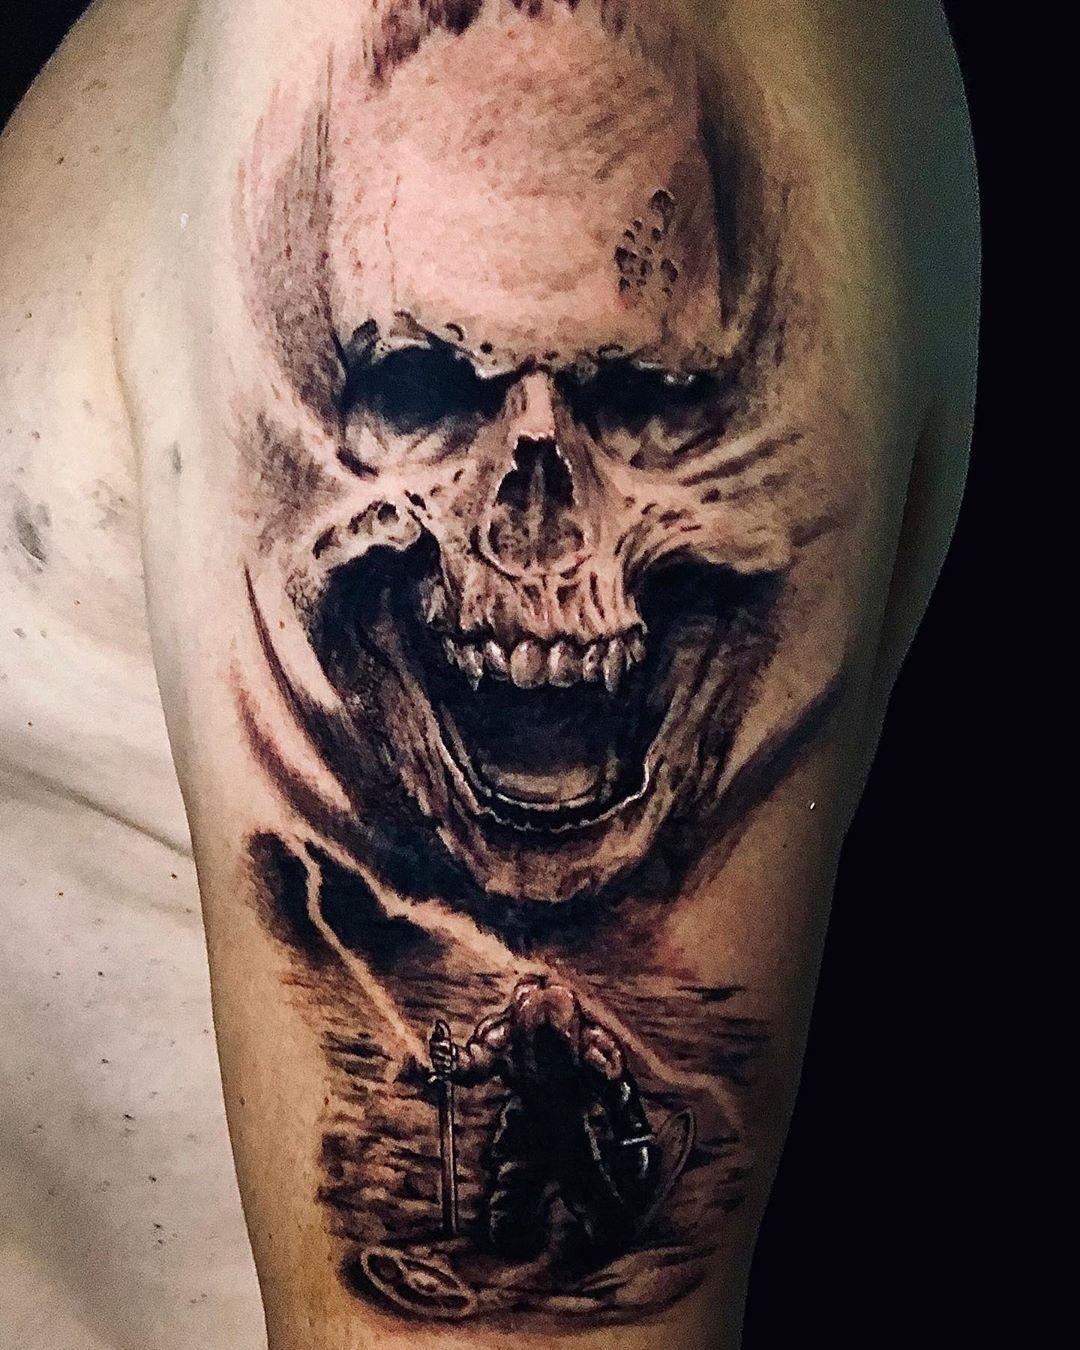 "Яɛ∂  Яσcκ  Ƭαттoσ  Ƨтʋ∂ισ on Instagram: ""#tatuaje #tattoo #ink #inked #tattoos #tattooed #tatuajes #tattooartist #art #tattooart #spain #tattoolife #inkedup #tattooing  #tattooist…"""